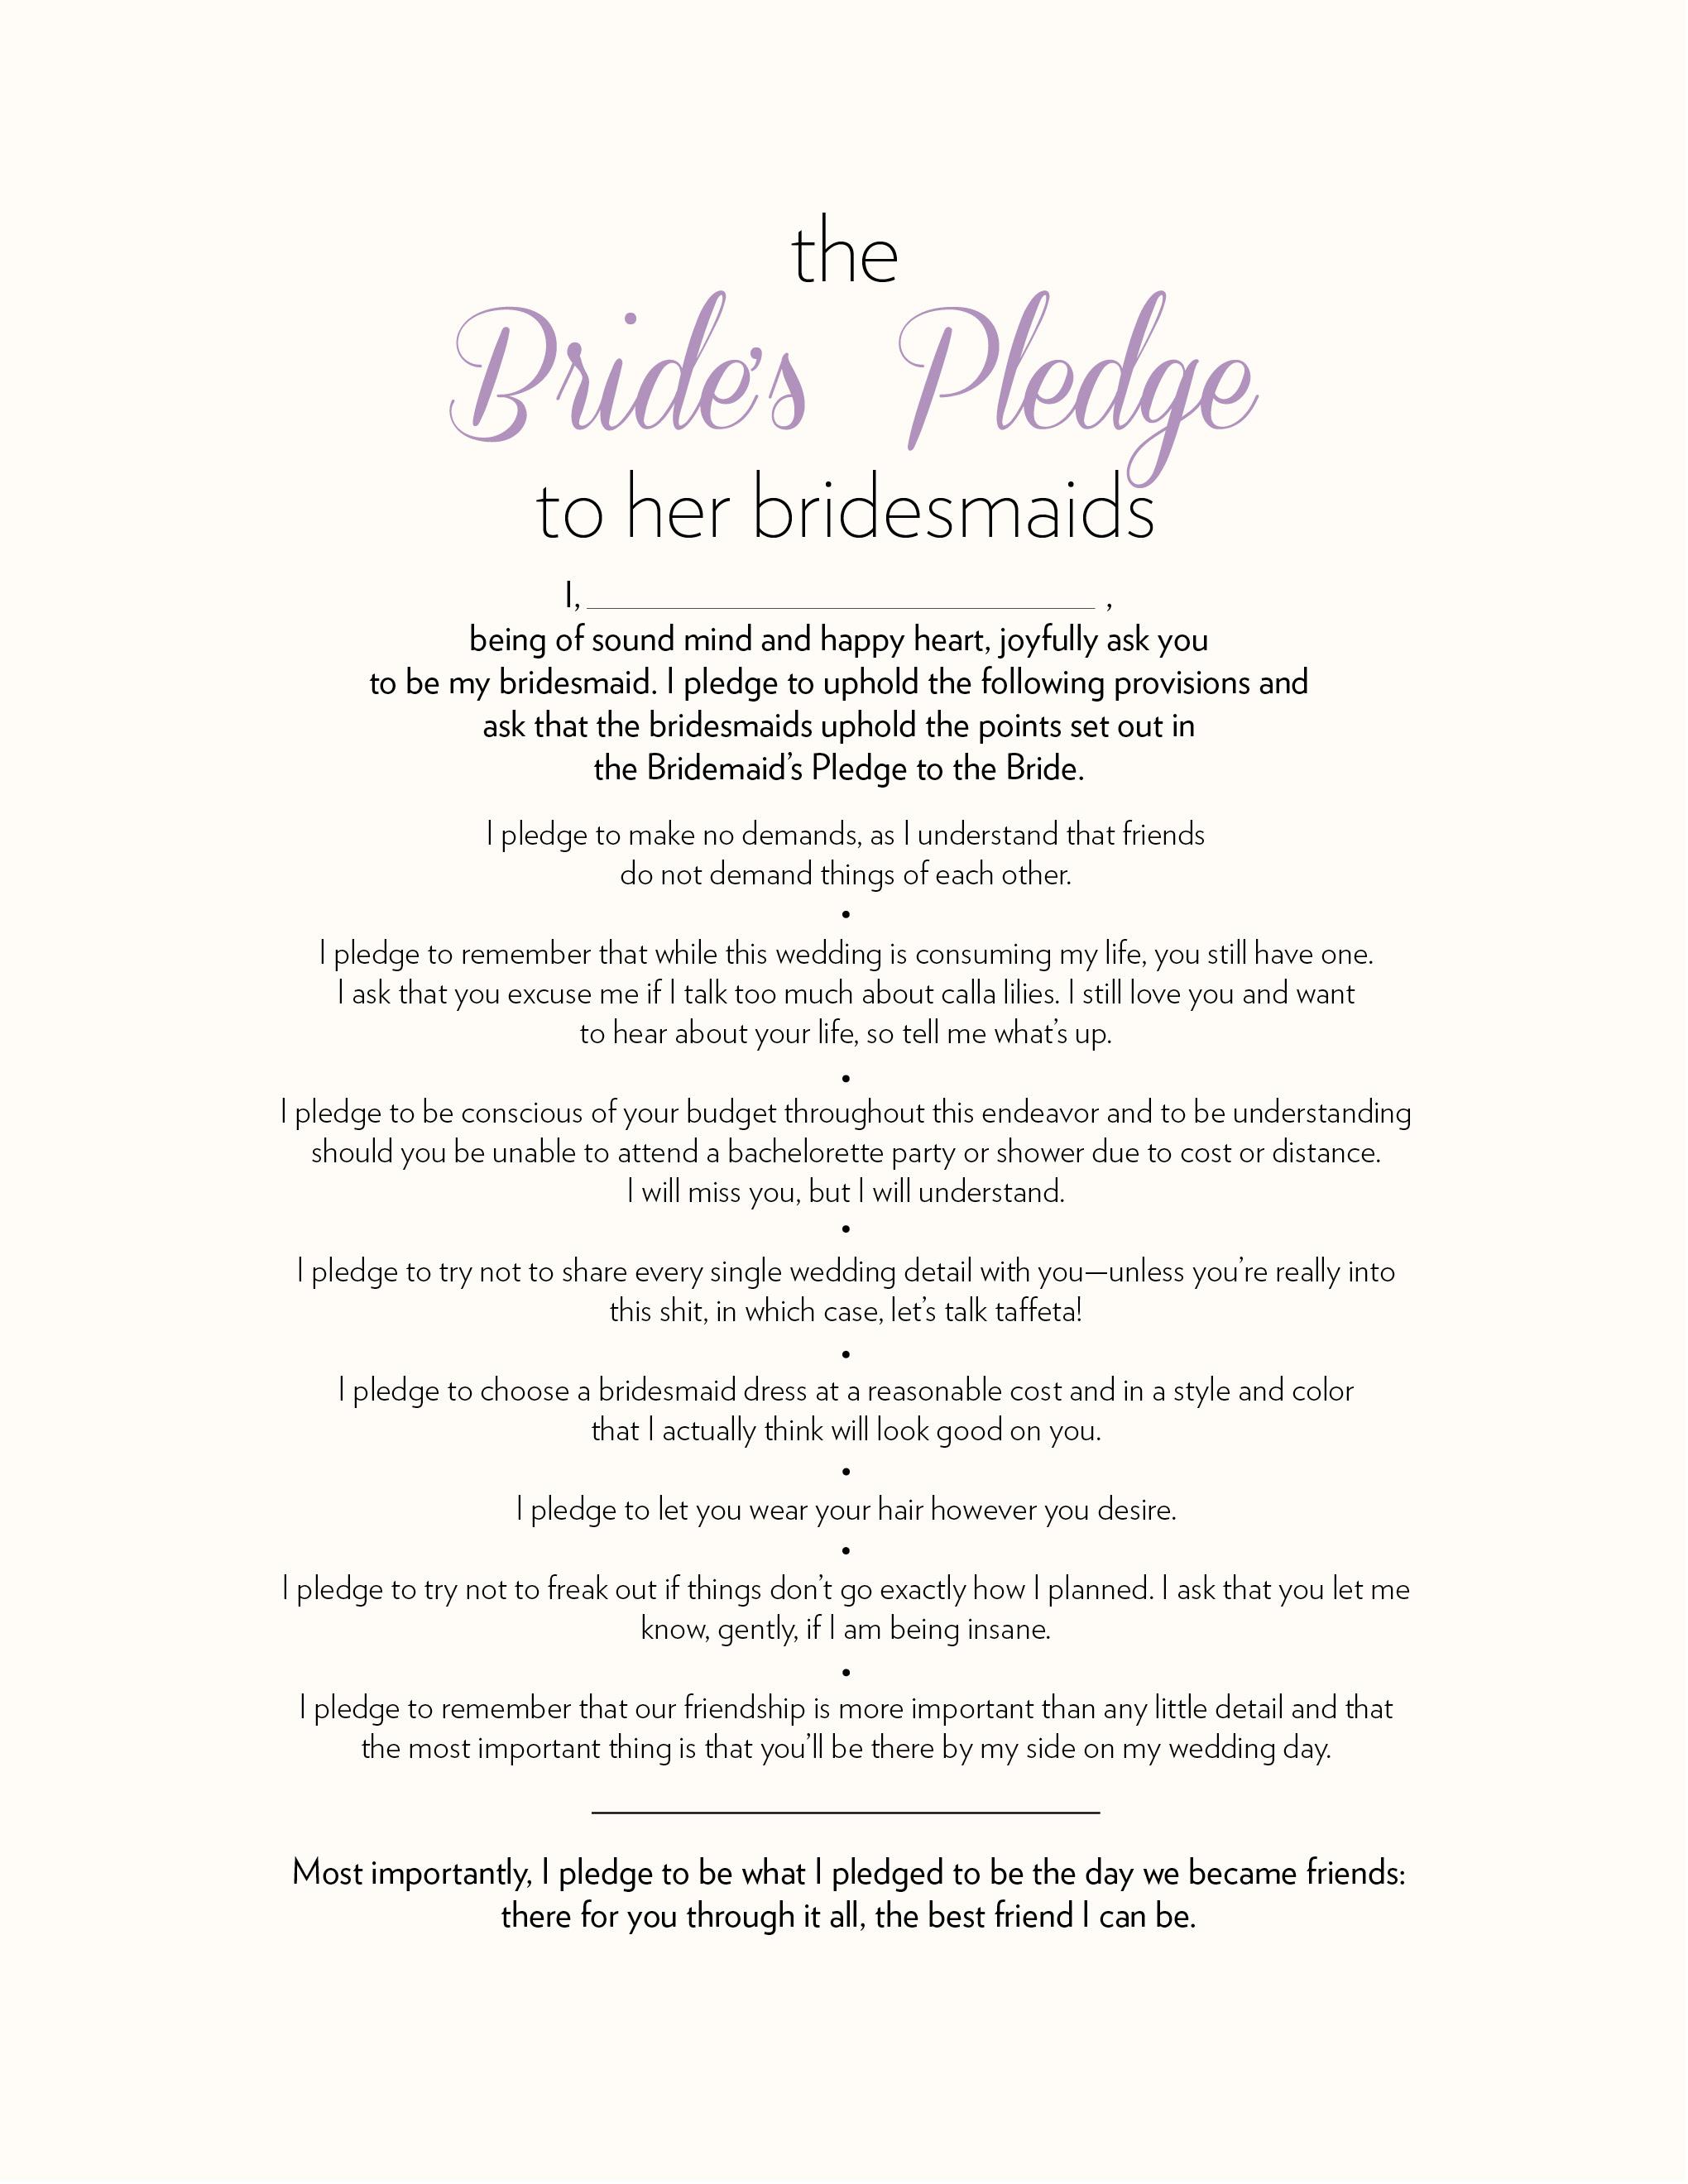 The Bride\'s Pledge to Her Bridesmaids - Ultimate Bridesmaid